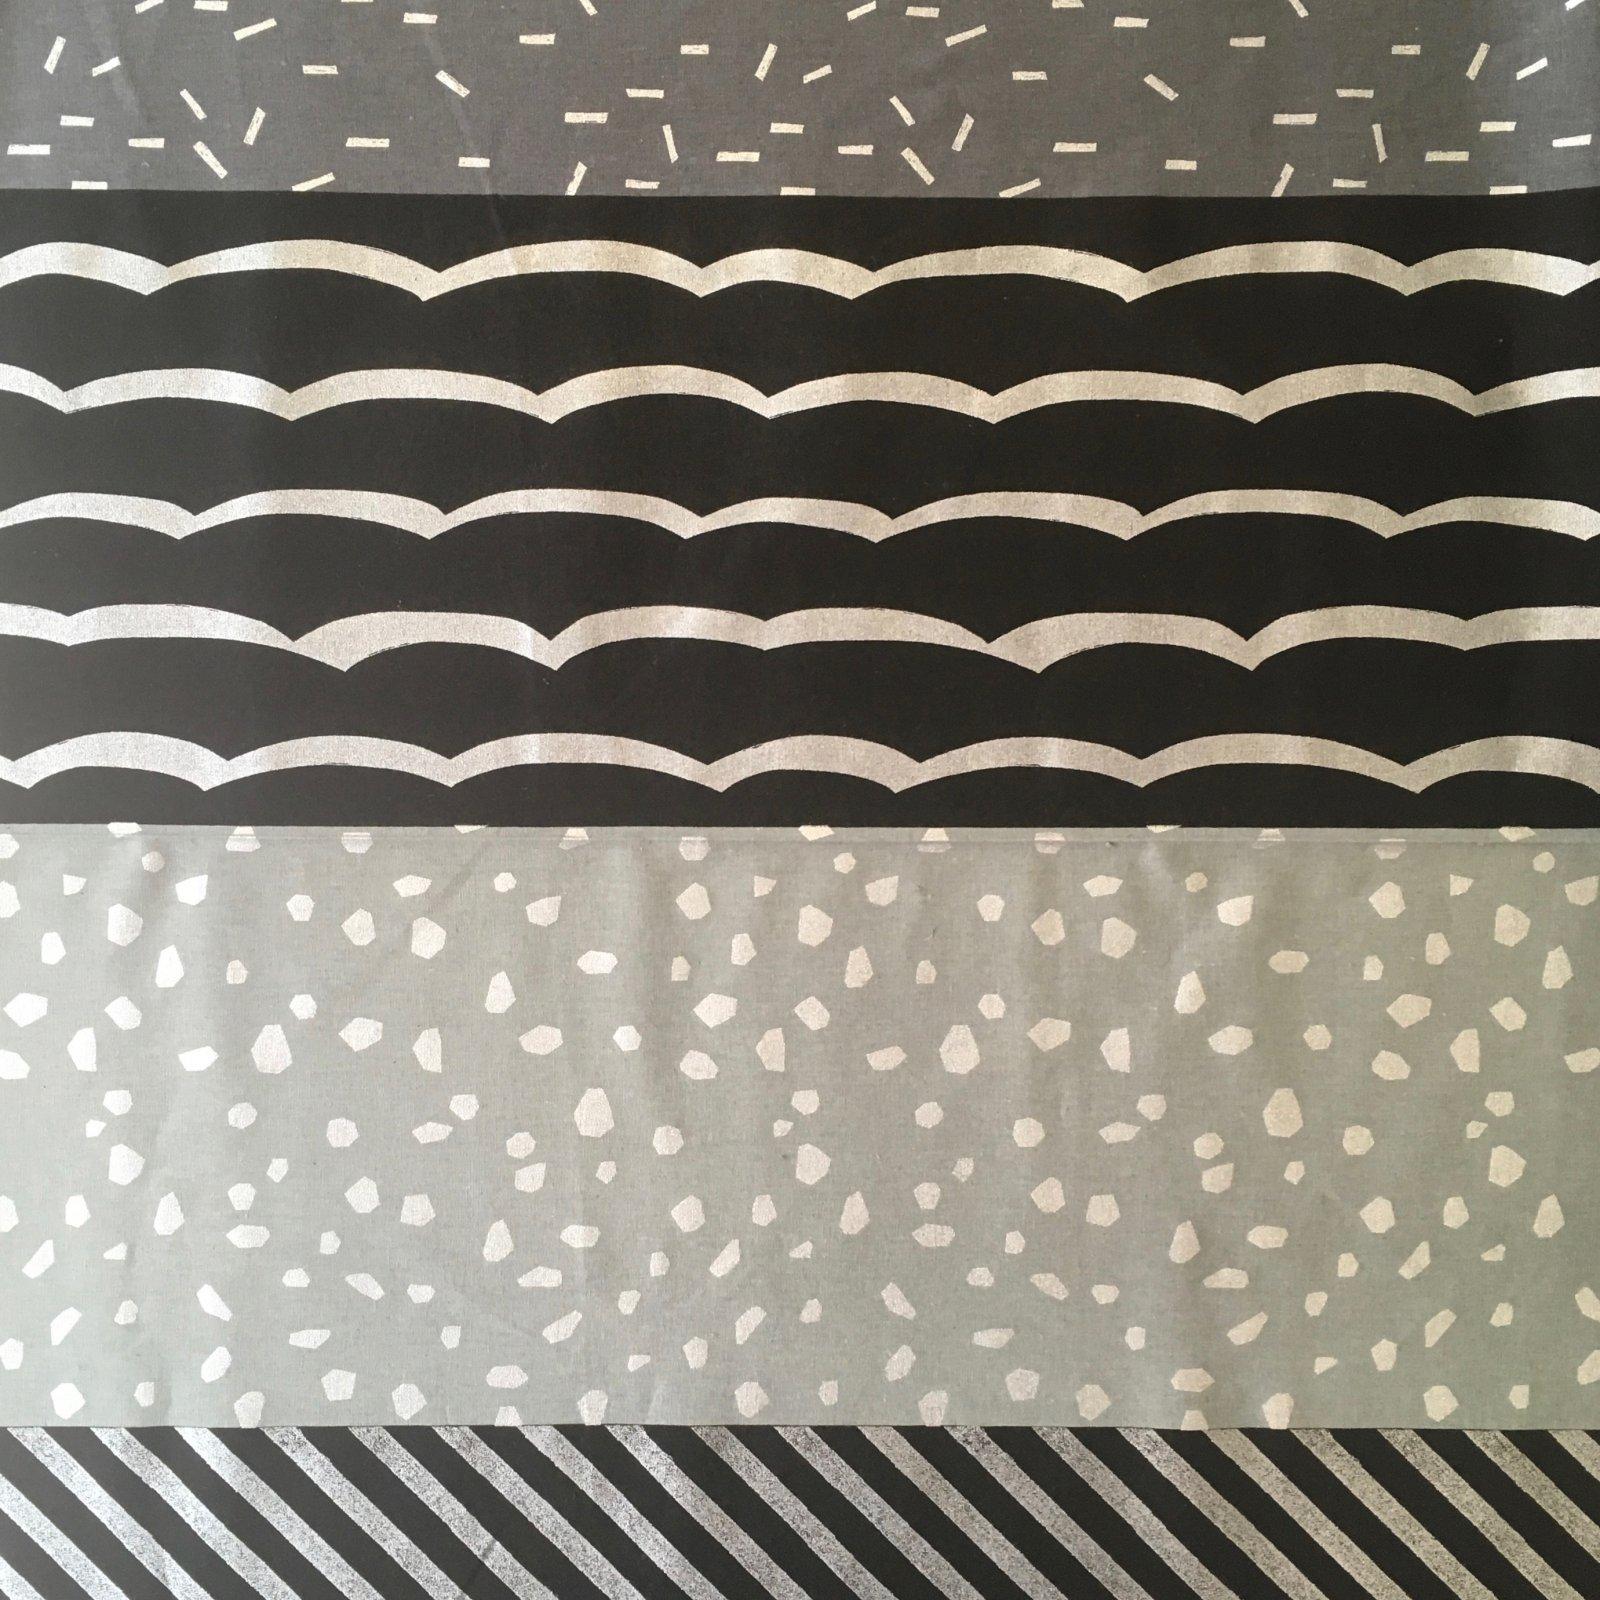 Echino Lightweight Canvas - Striped Happiness (Asphalt)